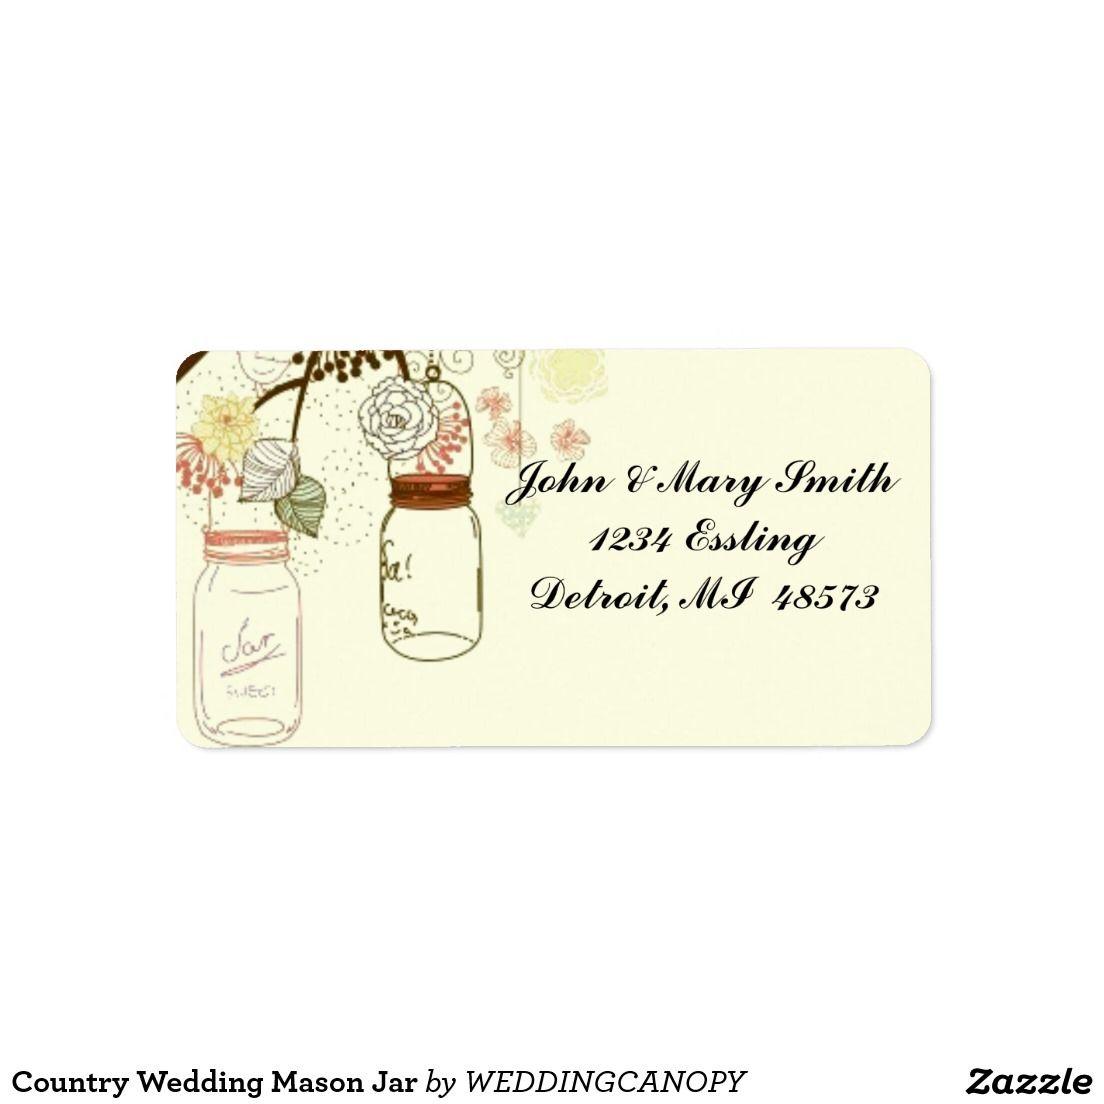 Country Wedding Mason Jar Personalized Address Labels